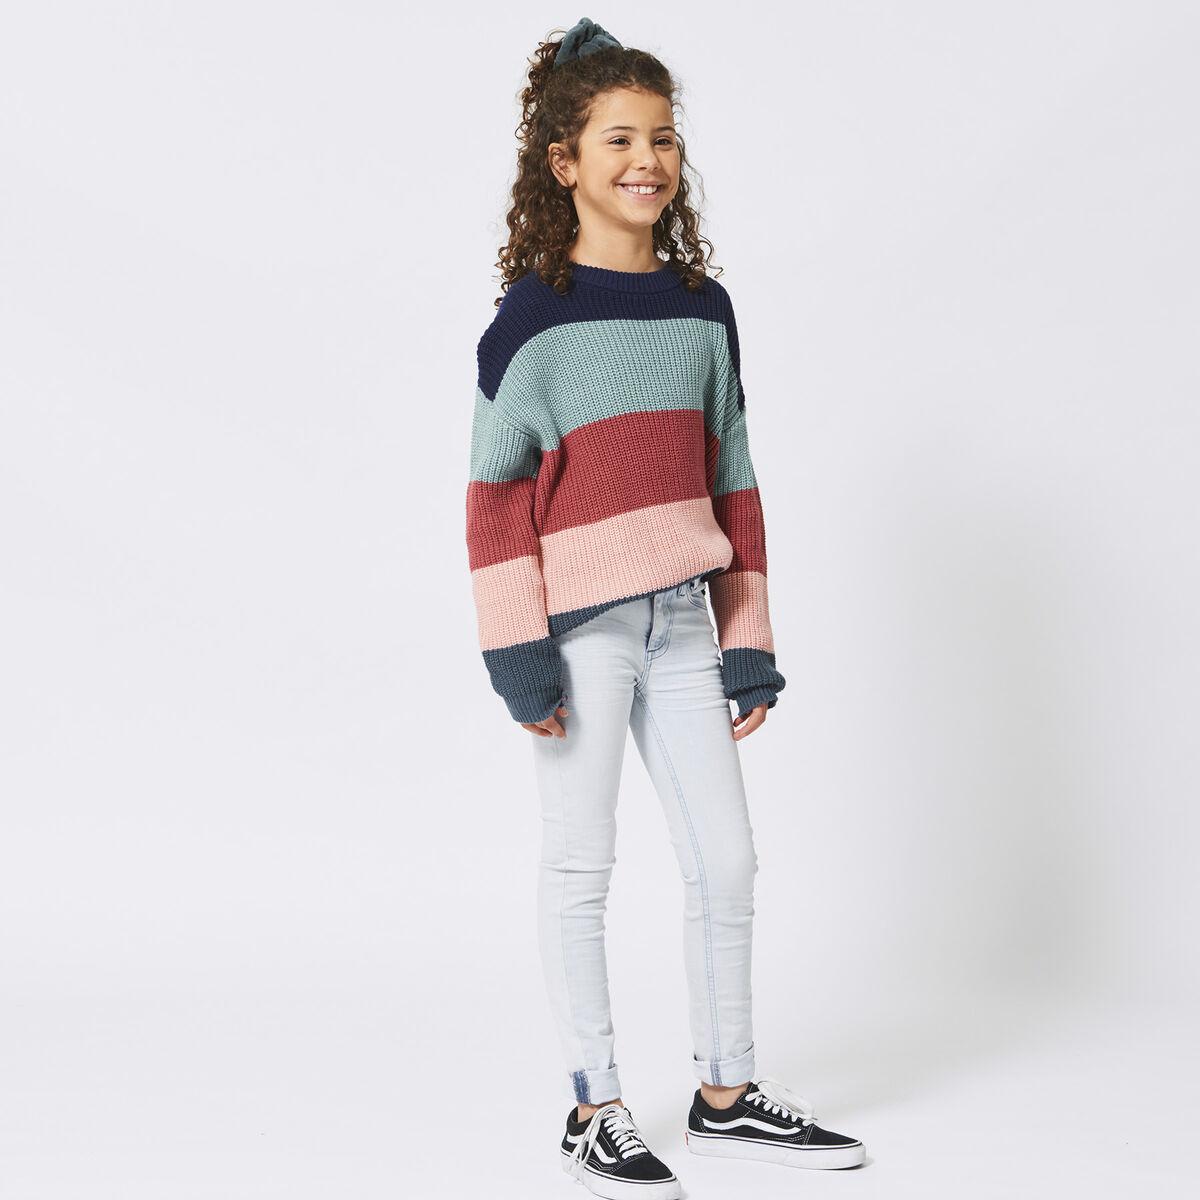 Jeans Emily Jr